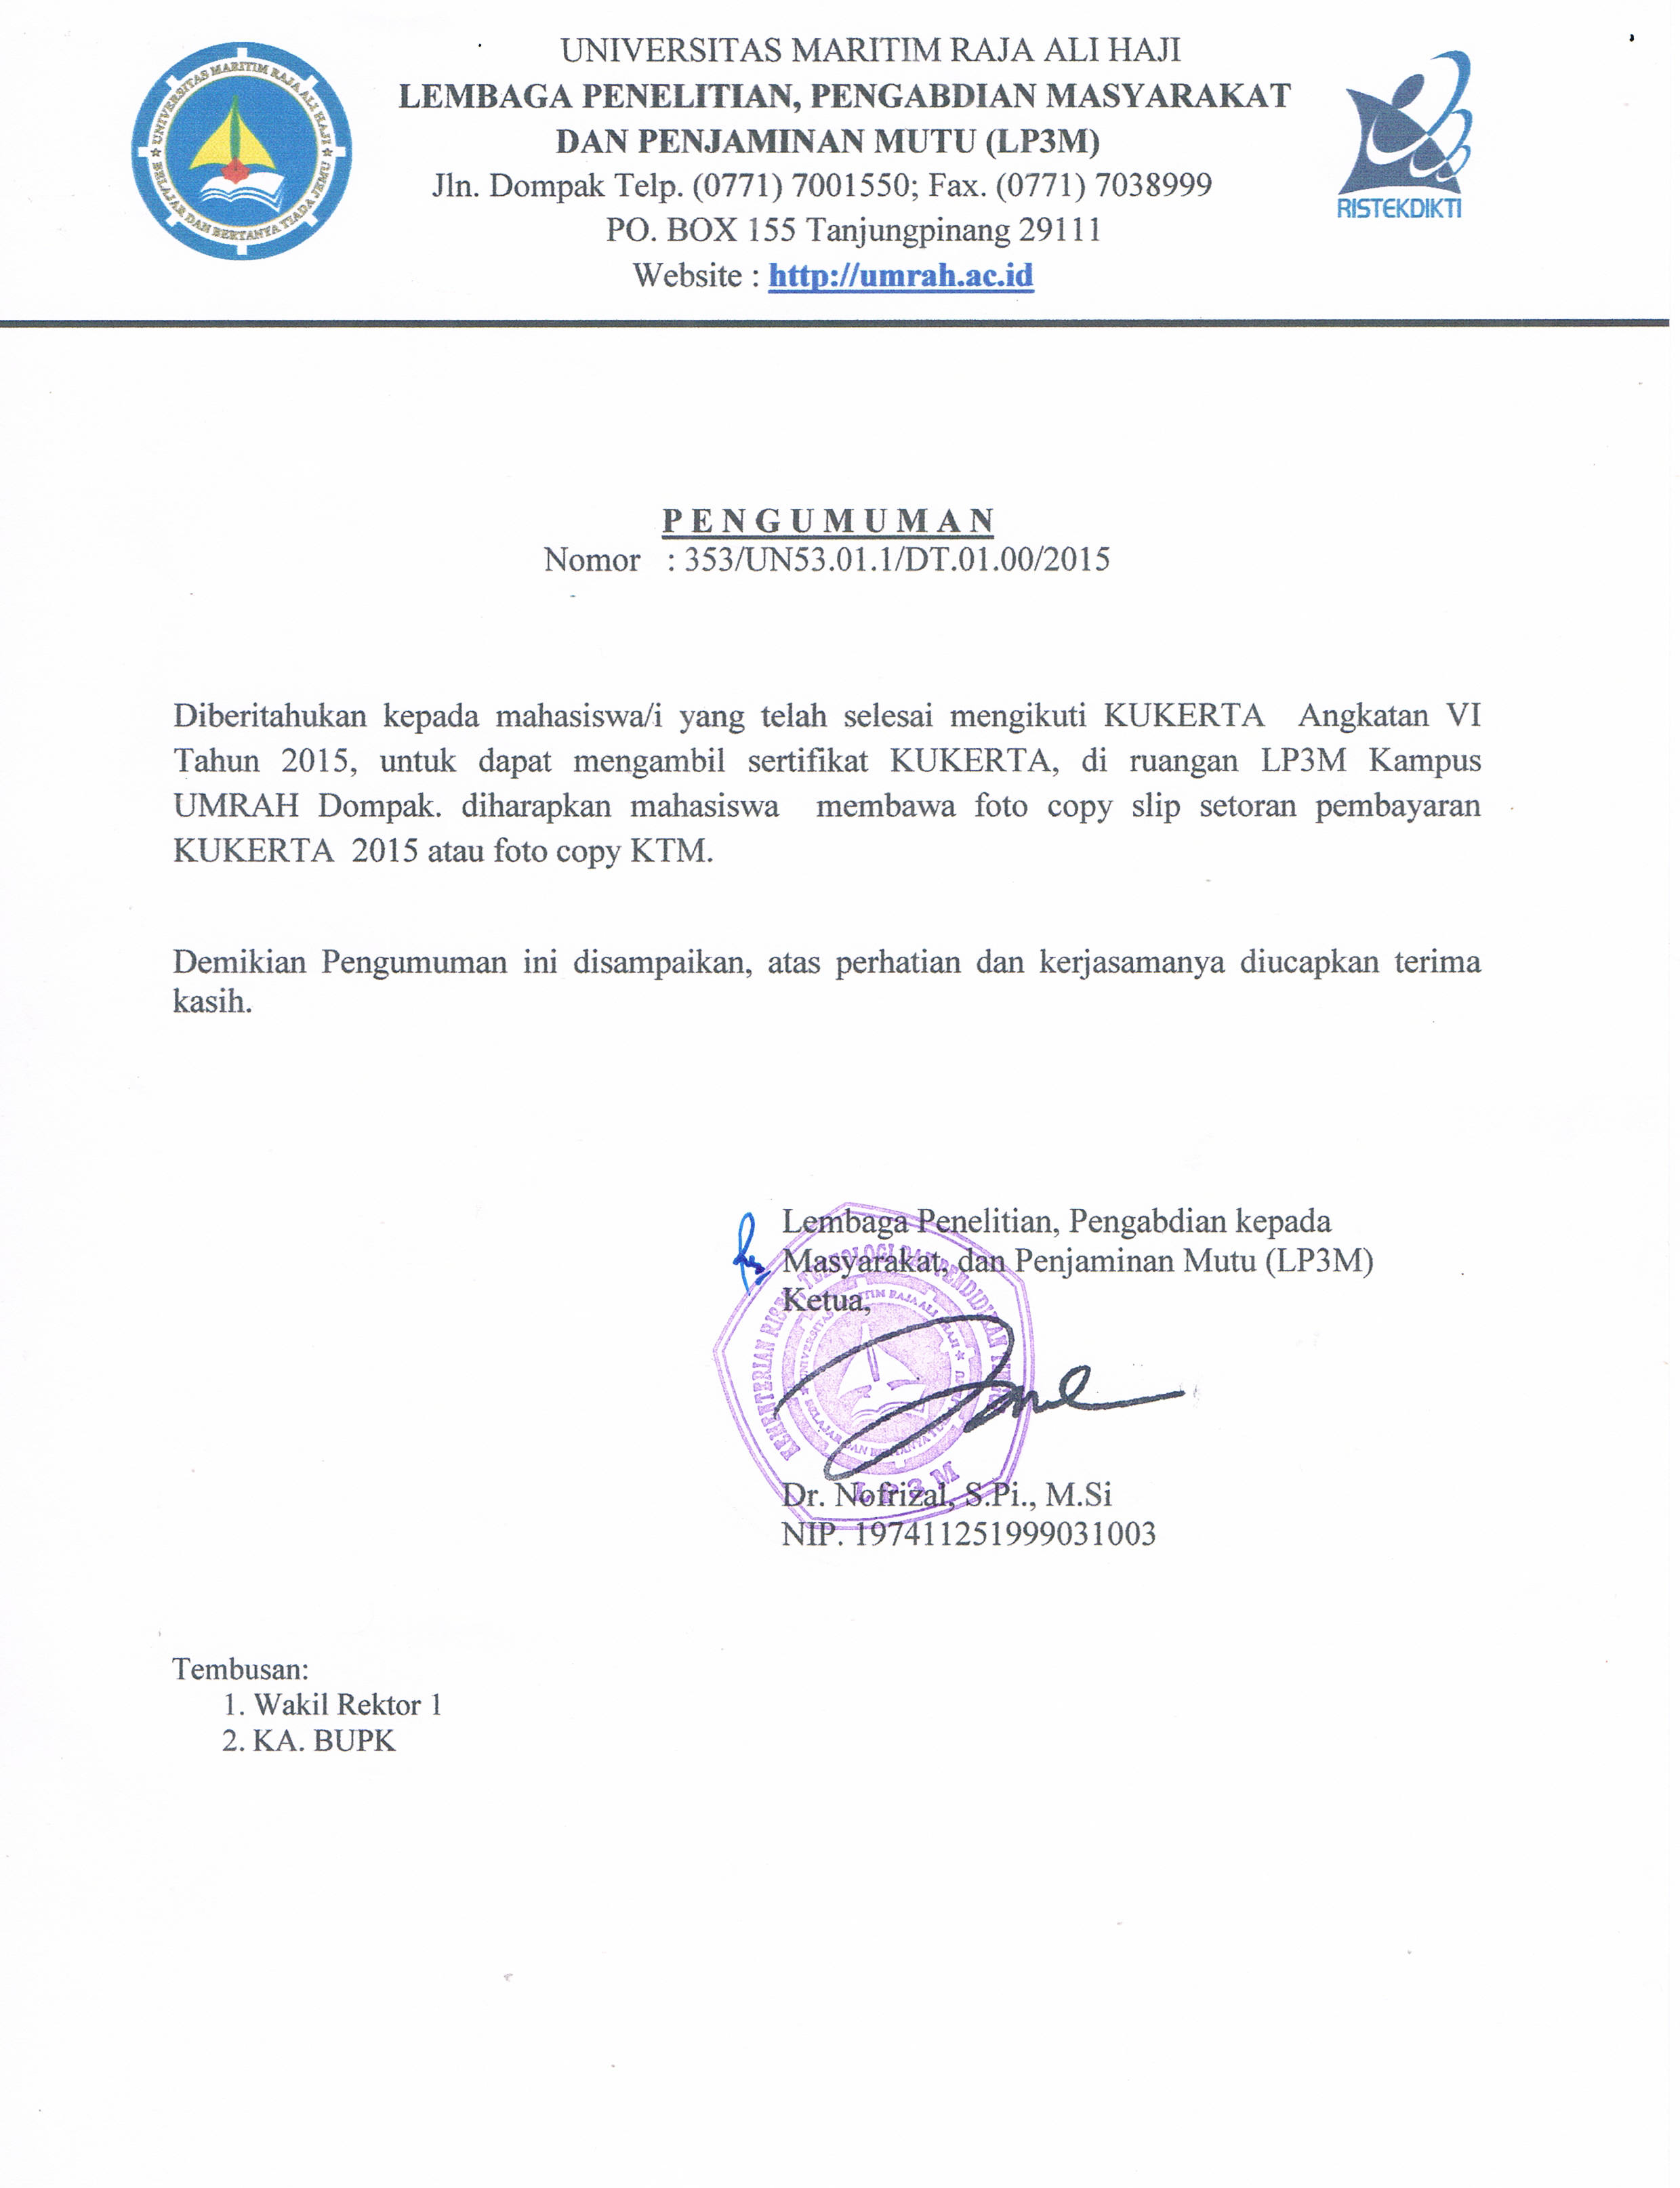 Permintaan Dokumen Pemeriksaan BPK 2015